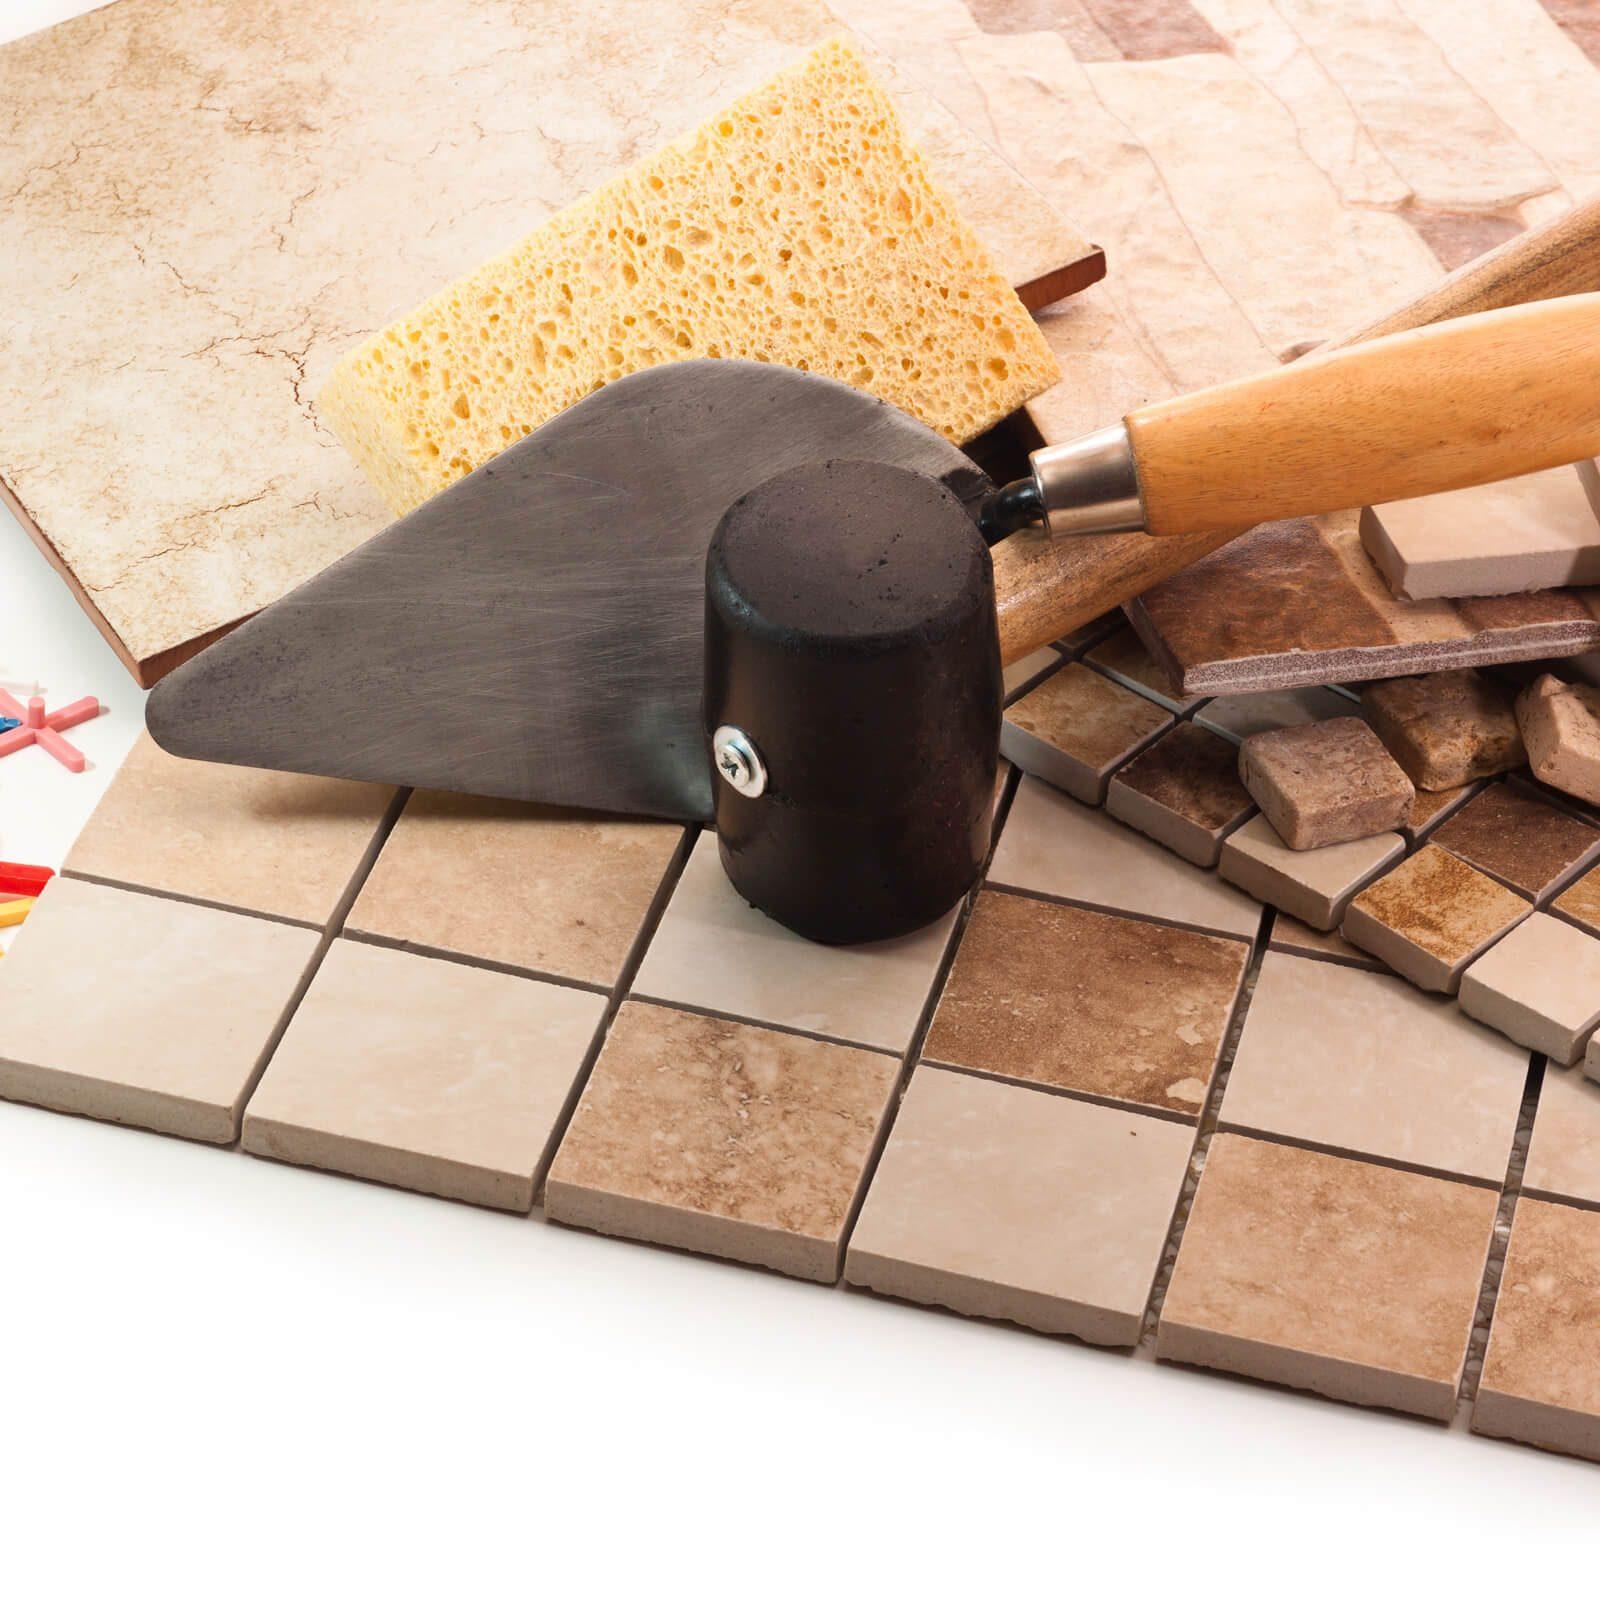 Tile installation process | BMG Flooring & Tile Center